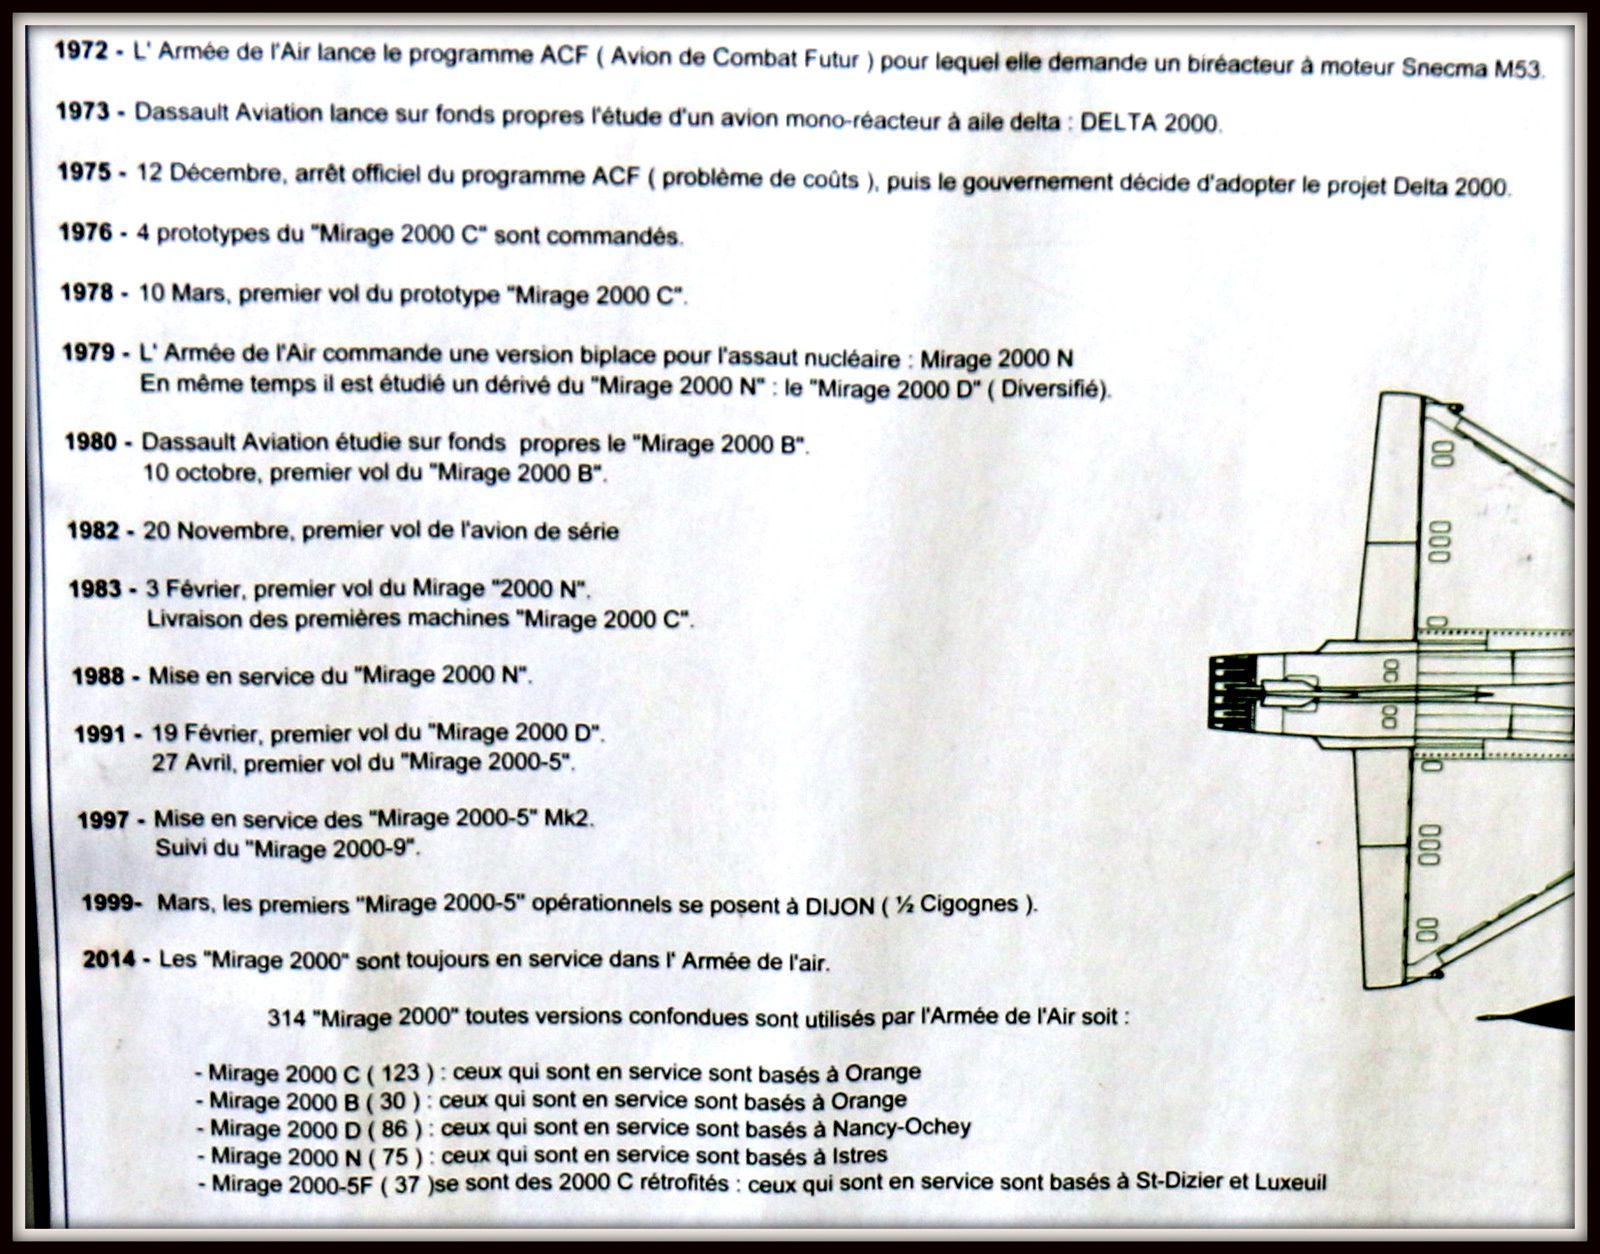 Dassault &quot&#x3B;Mirage 2000 B&quot&#x3B;